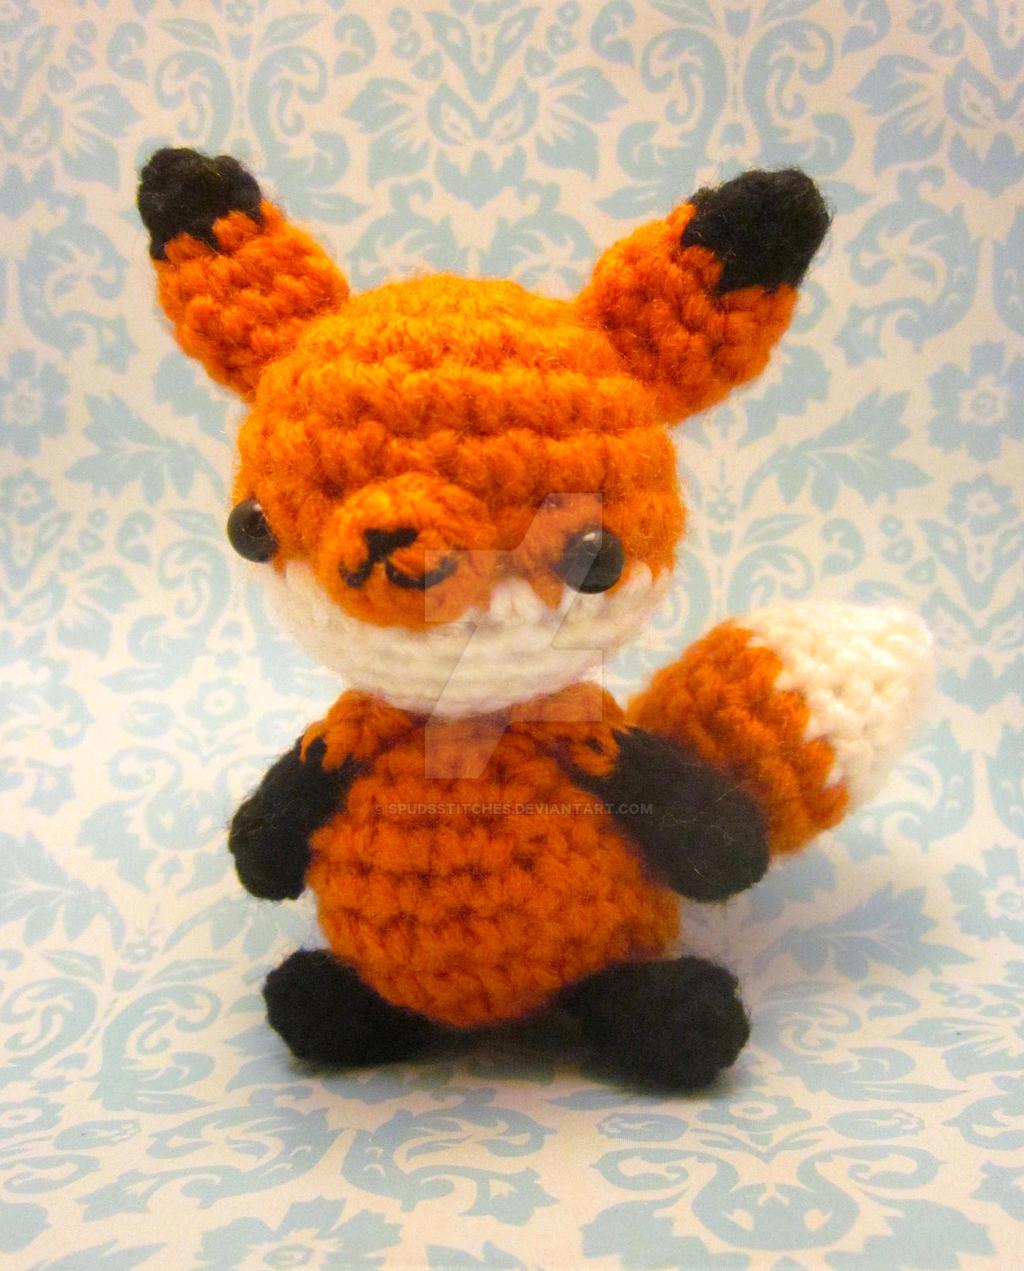 Little Fox Amigurumi : Kawaii Wee Little Fox Amigurumi by Spudsstitches on DeviantArt